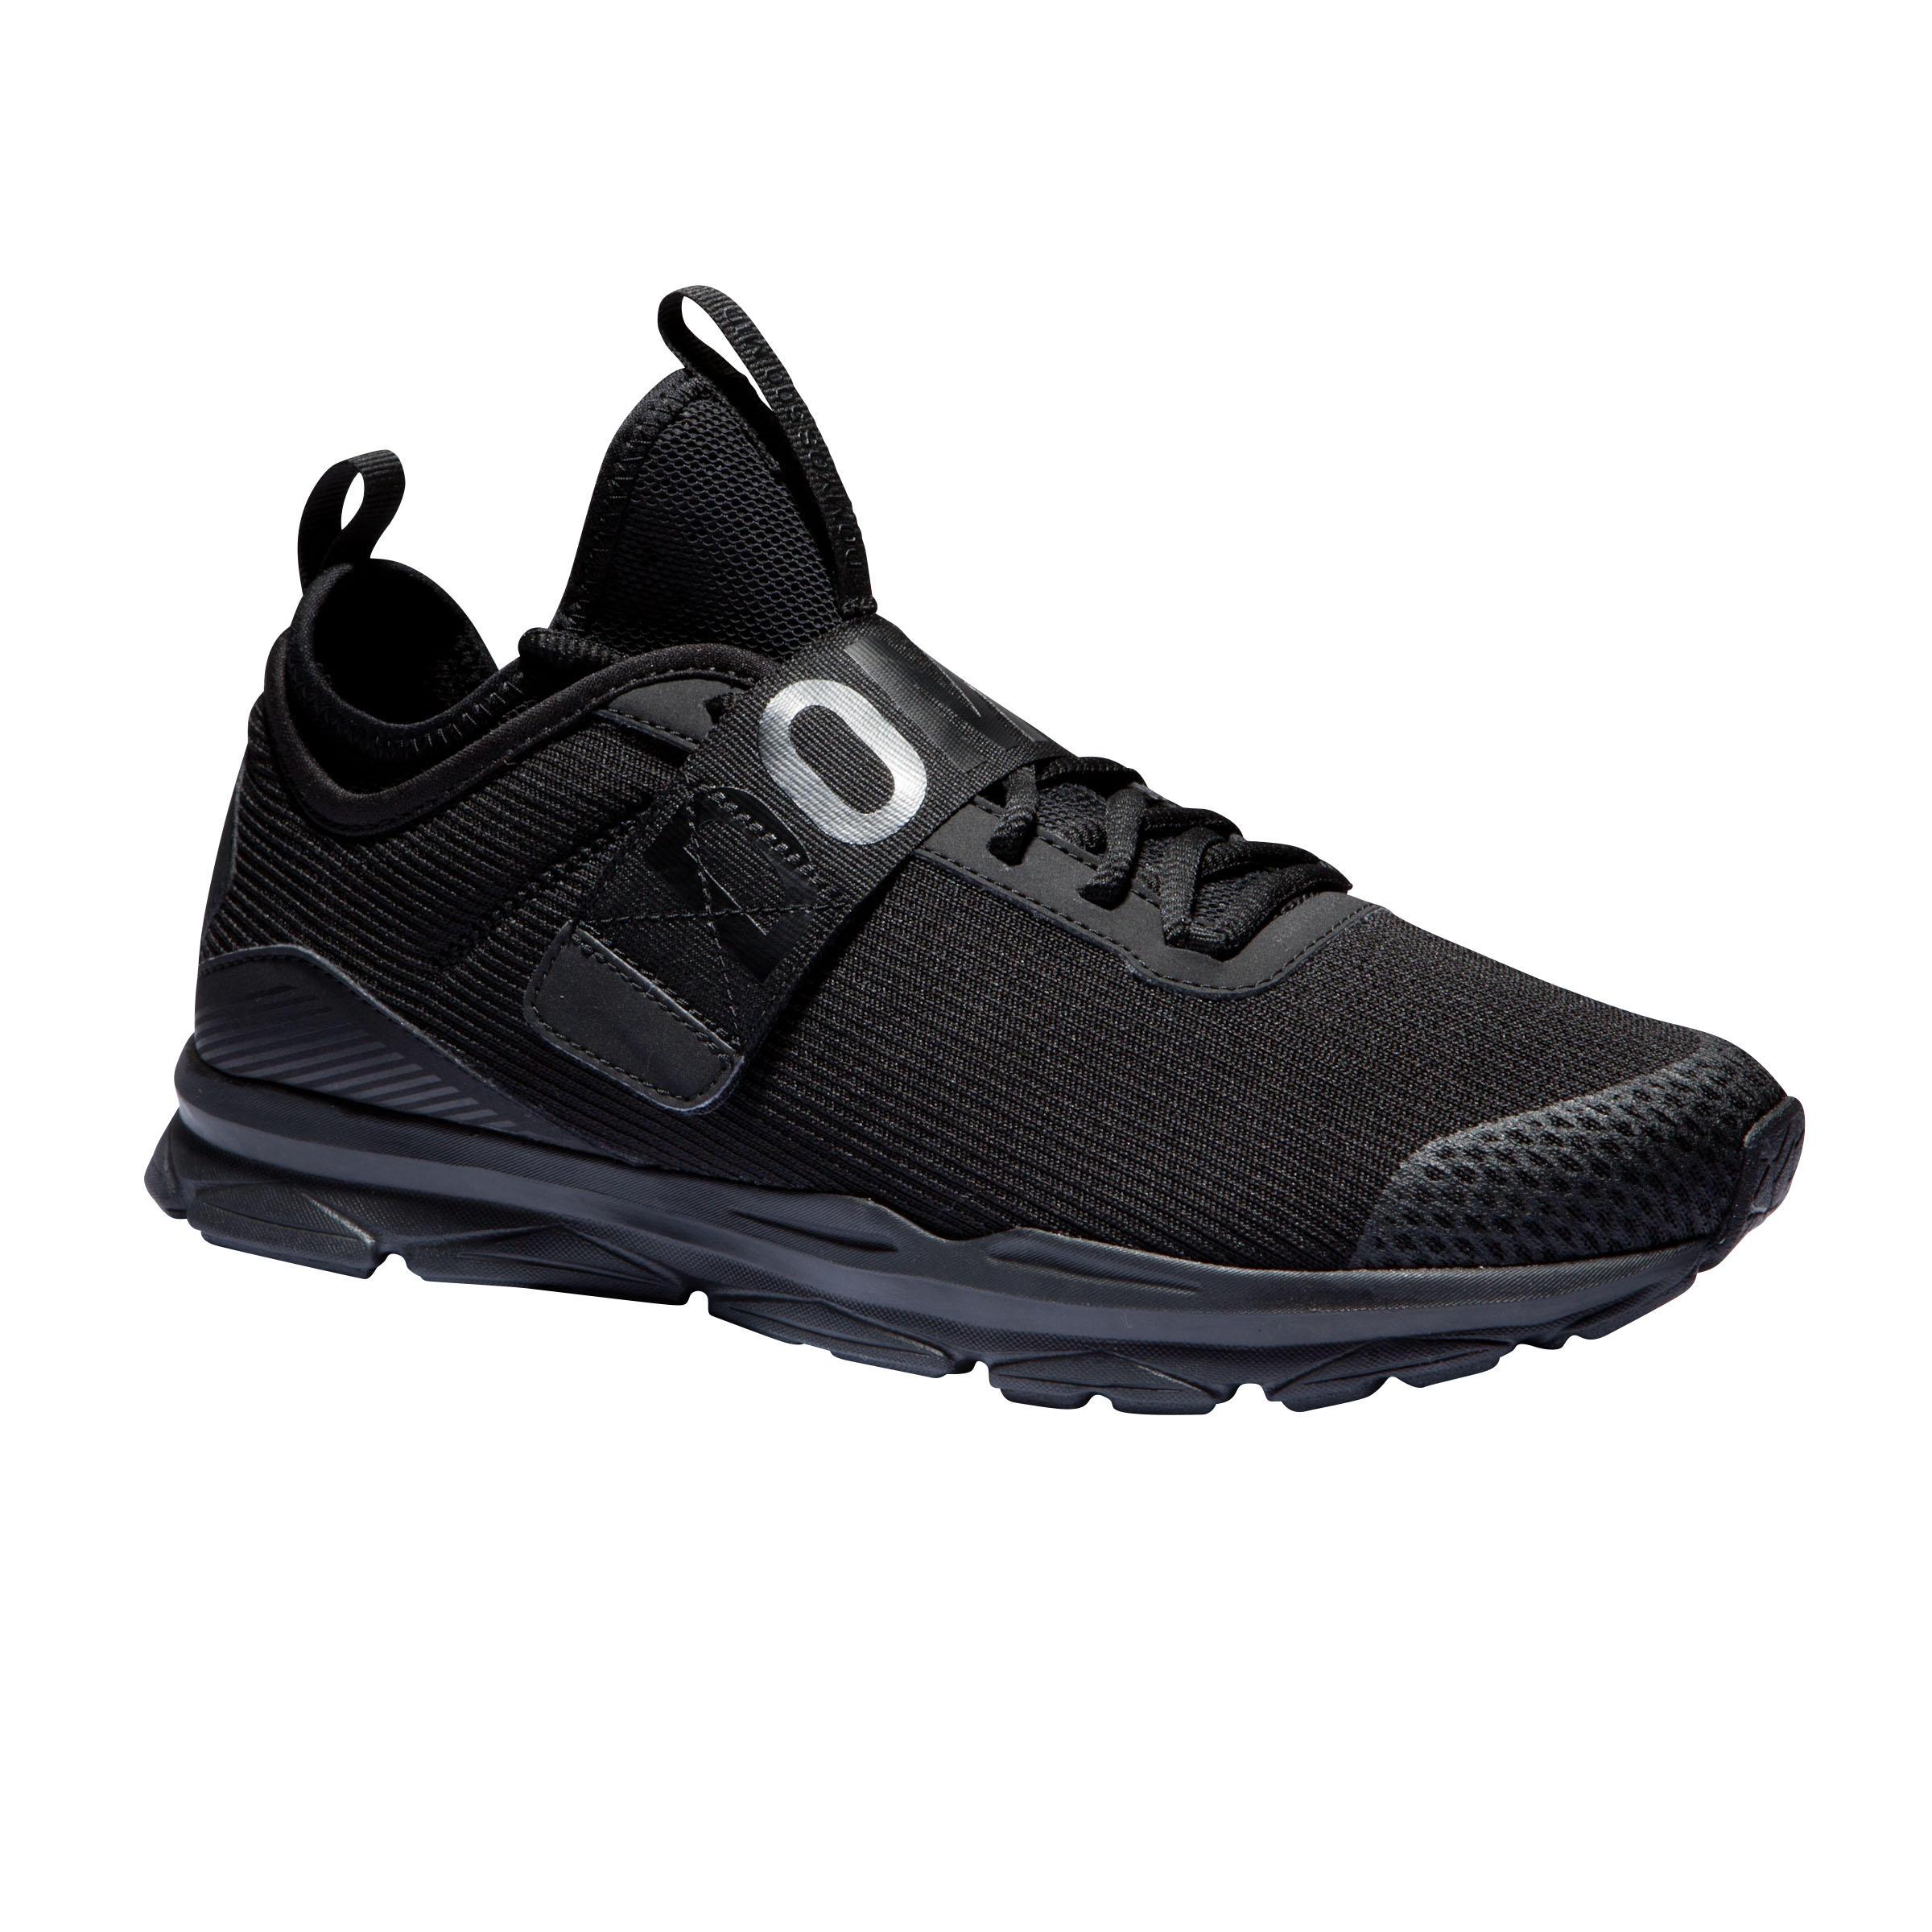 Fitnessschuhe 500 Mid Fitness Cardio Damen schwarz | Schuhe > Sportschuhe > Fitnessschuhe | Domyos